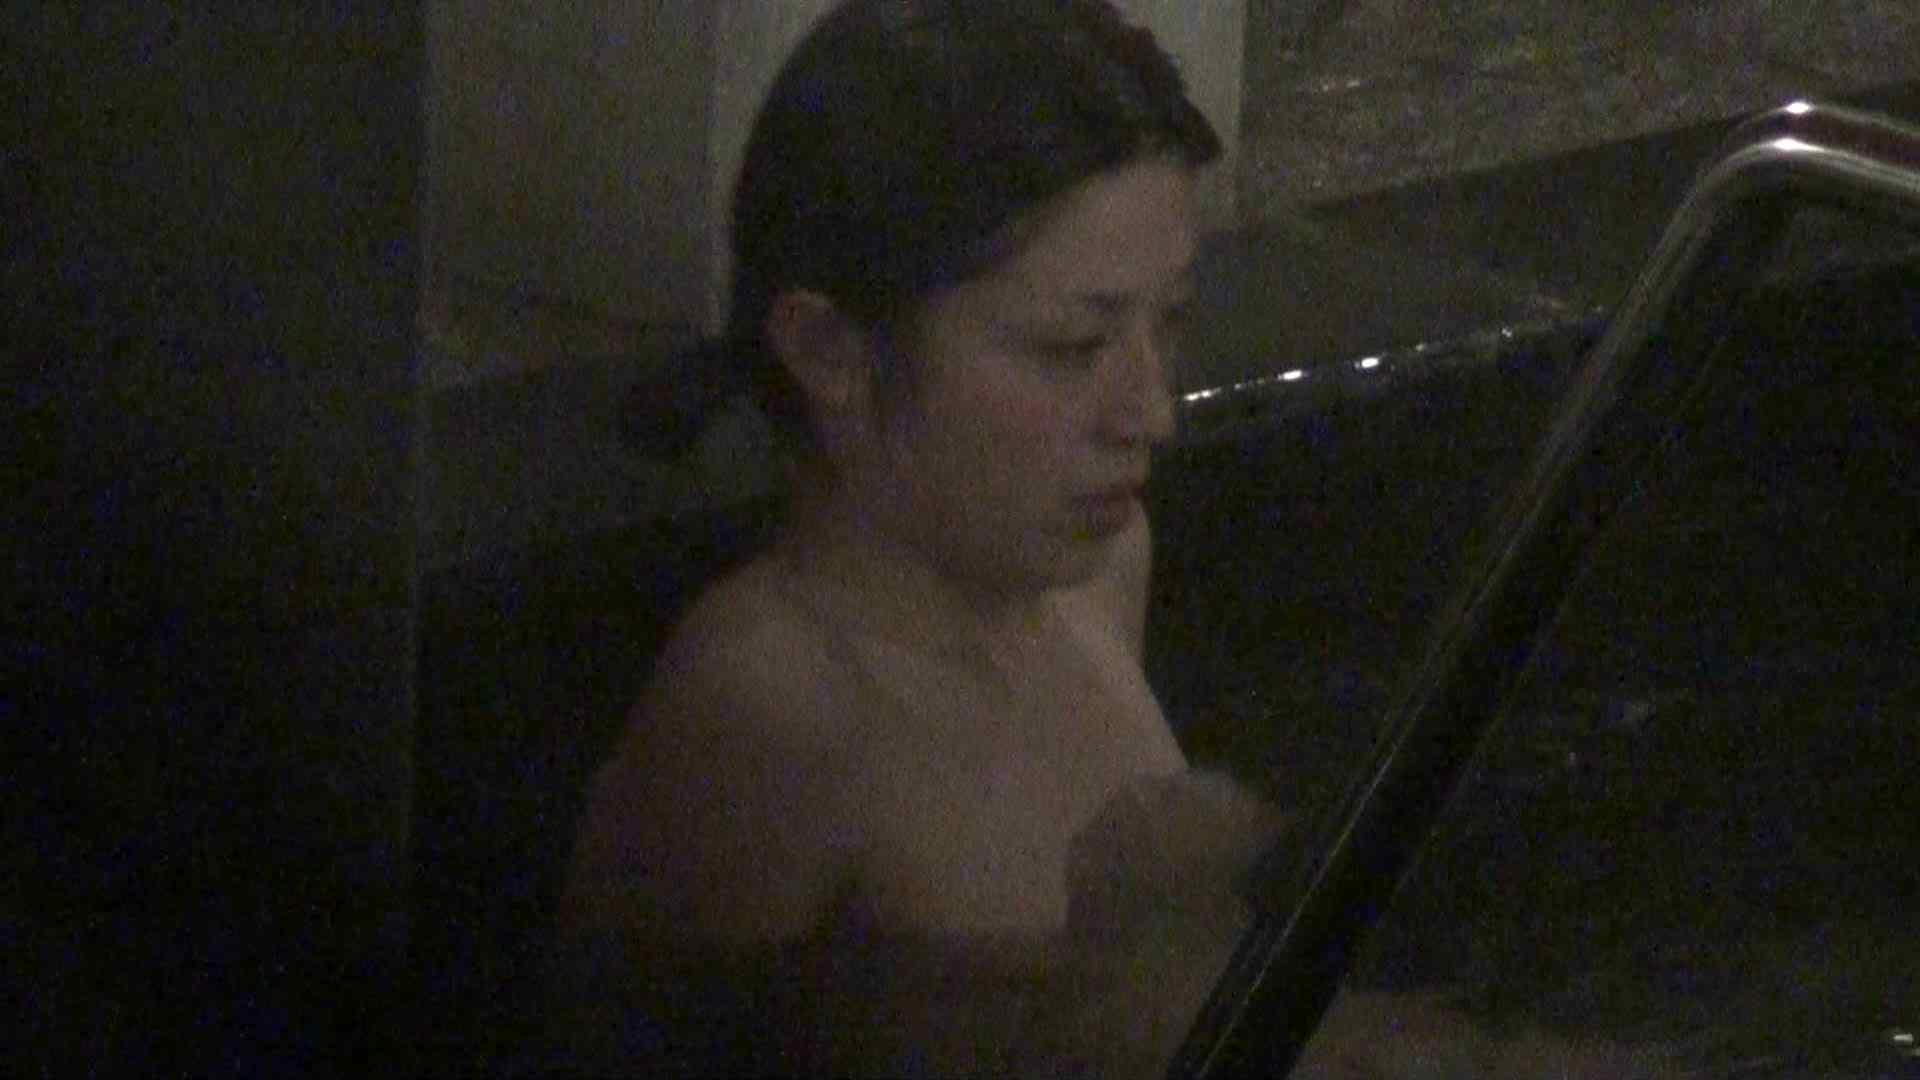 Aquaな露天風呂Vol.344 いやらしいOL セックス画像 75連発 17